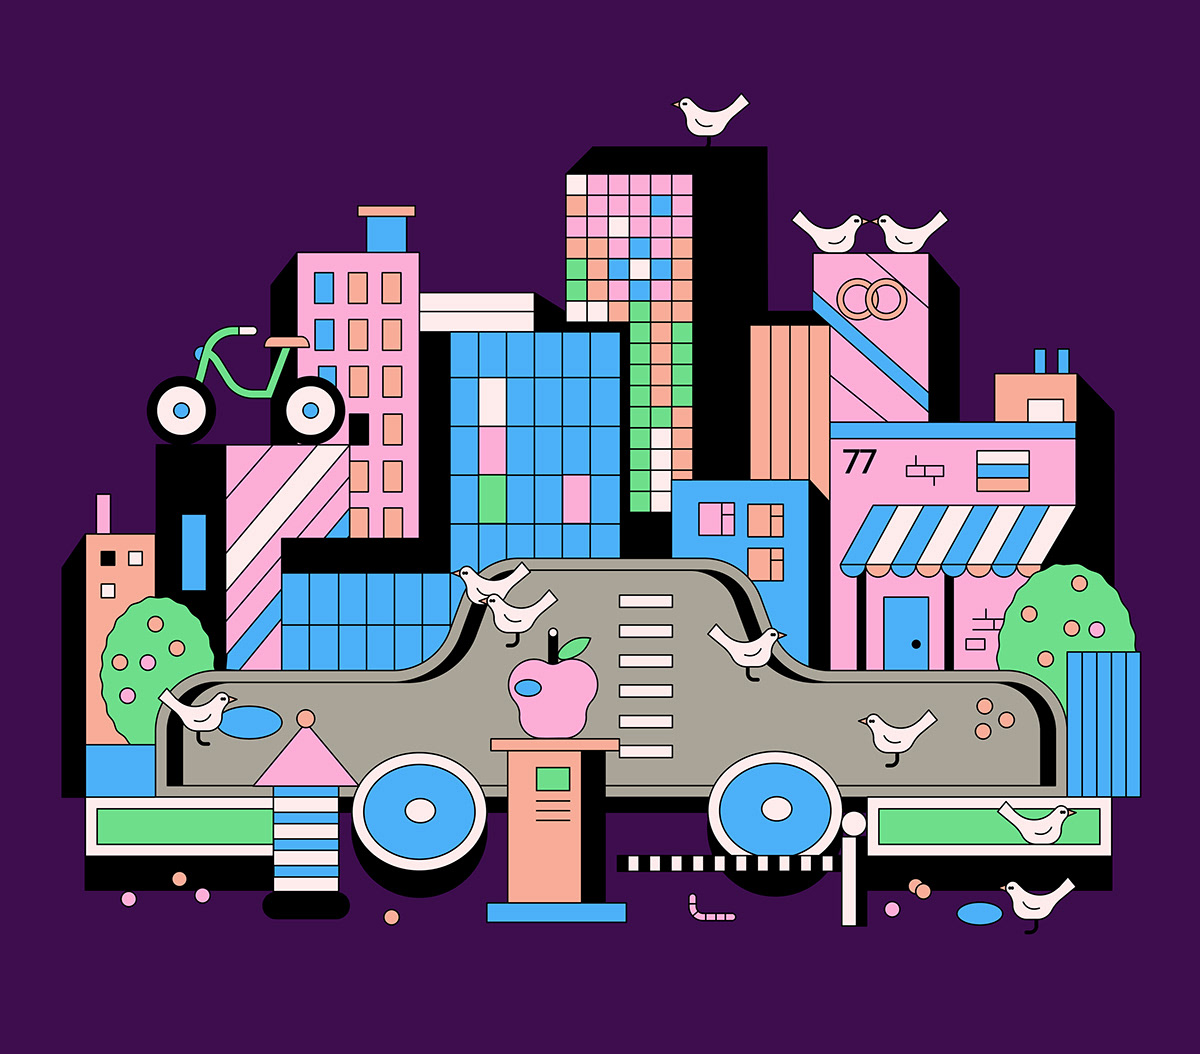 tinkoff journal editorial vector illustrations Illustrator business itwazcool